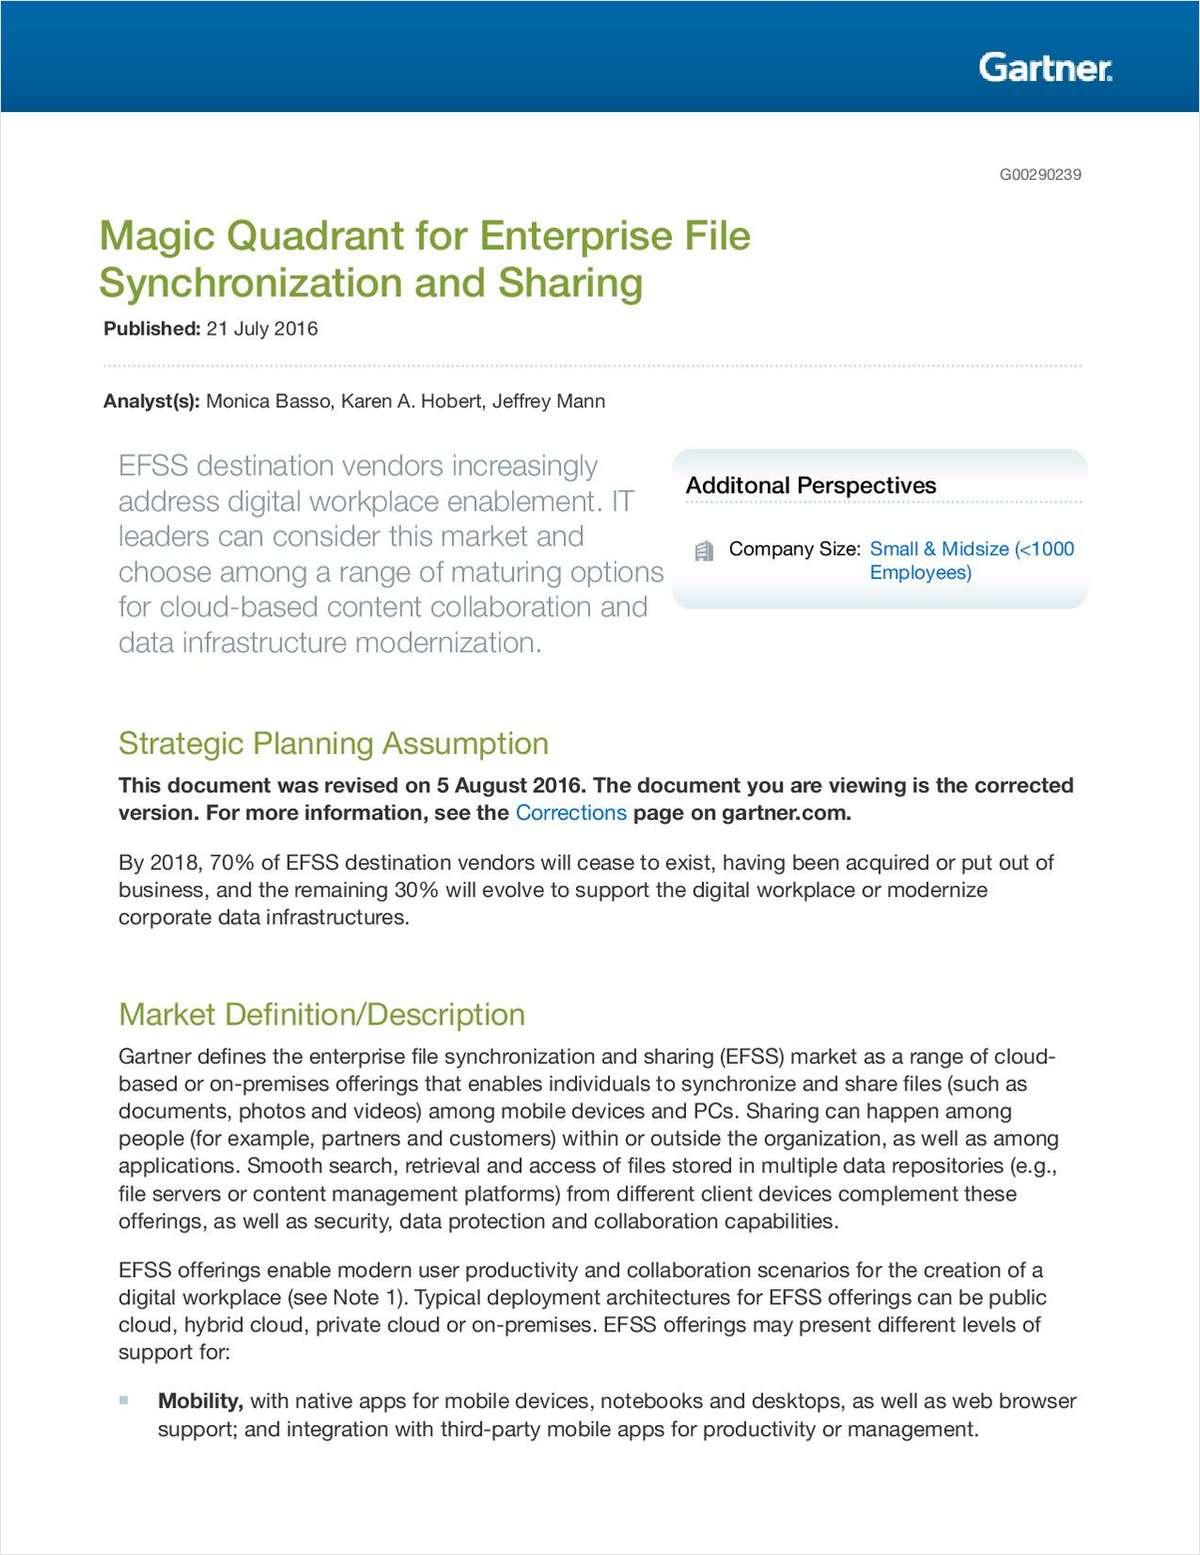 Gartner Magic Quadrant for Enterprise File Synchronization and Sharing